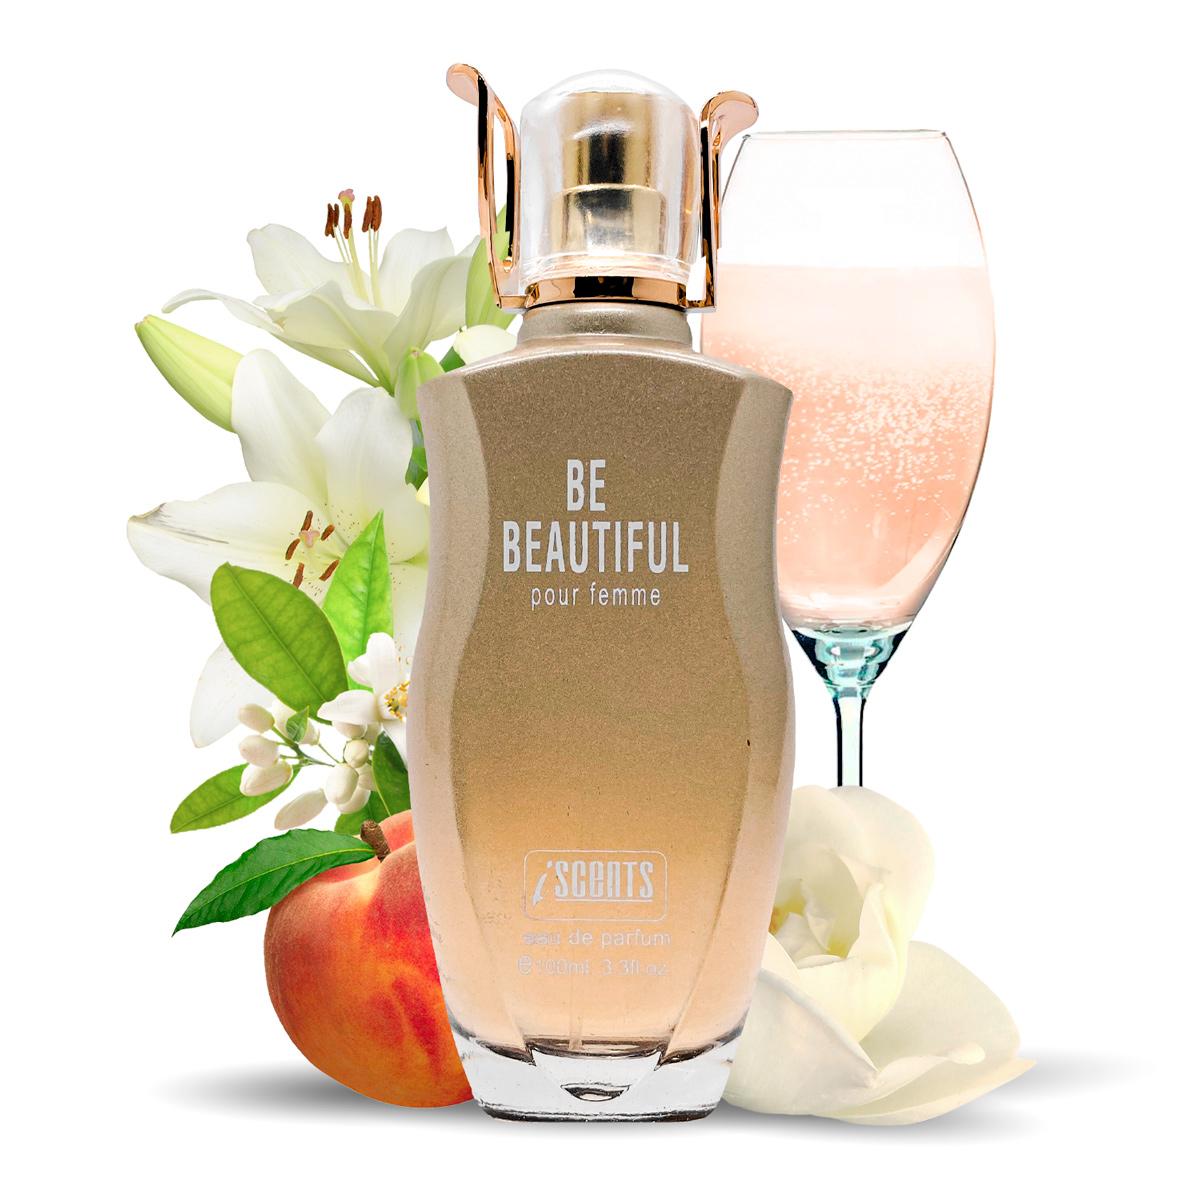 Kit 2 Perfumes Import Be Beautiful e Silver Spirit I Scents